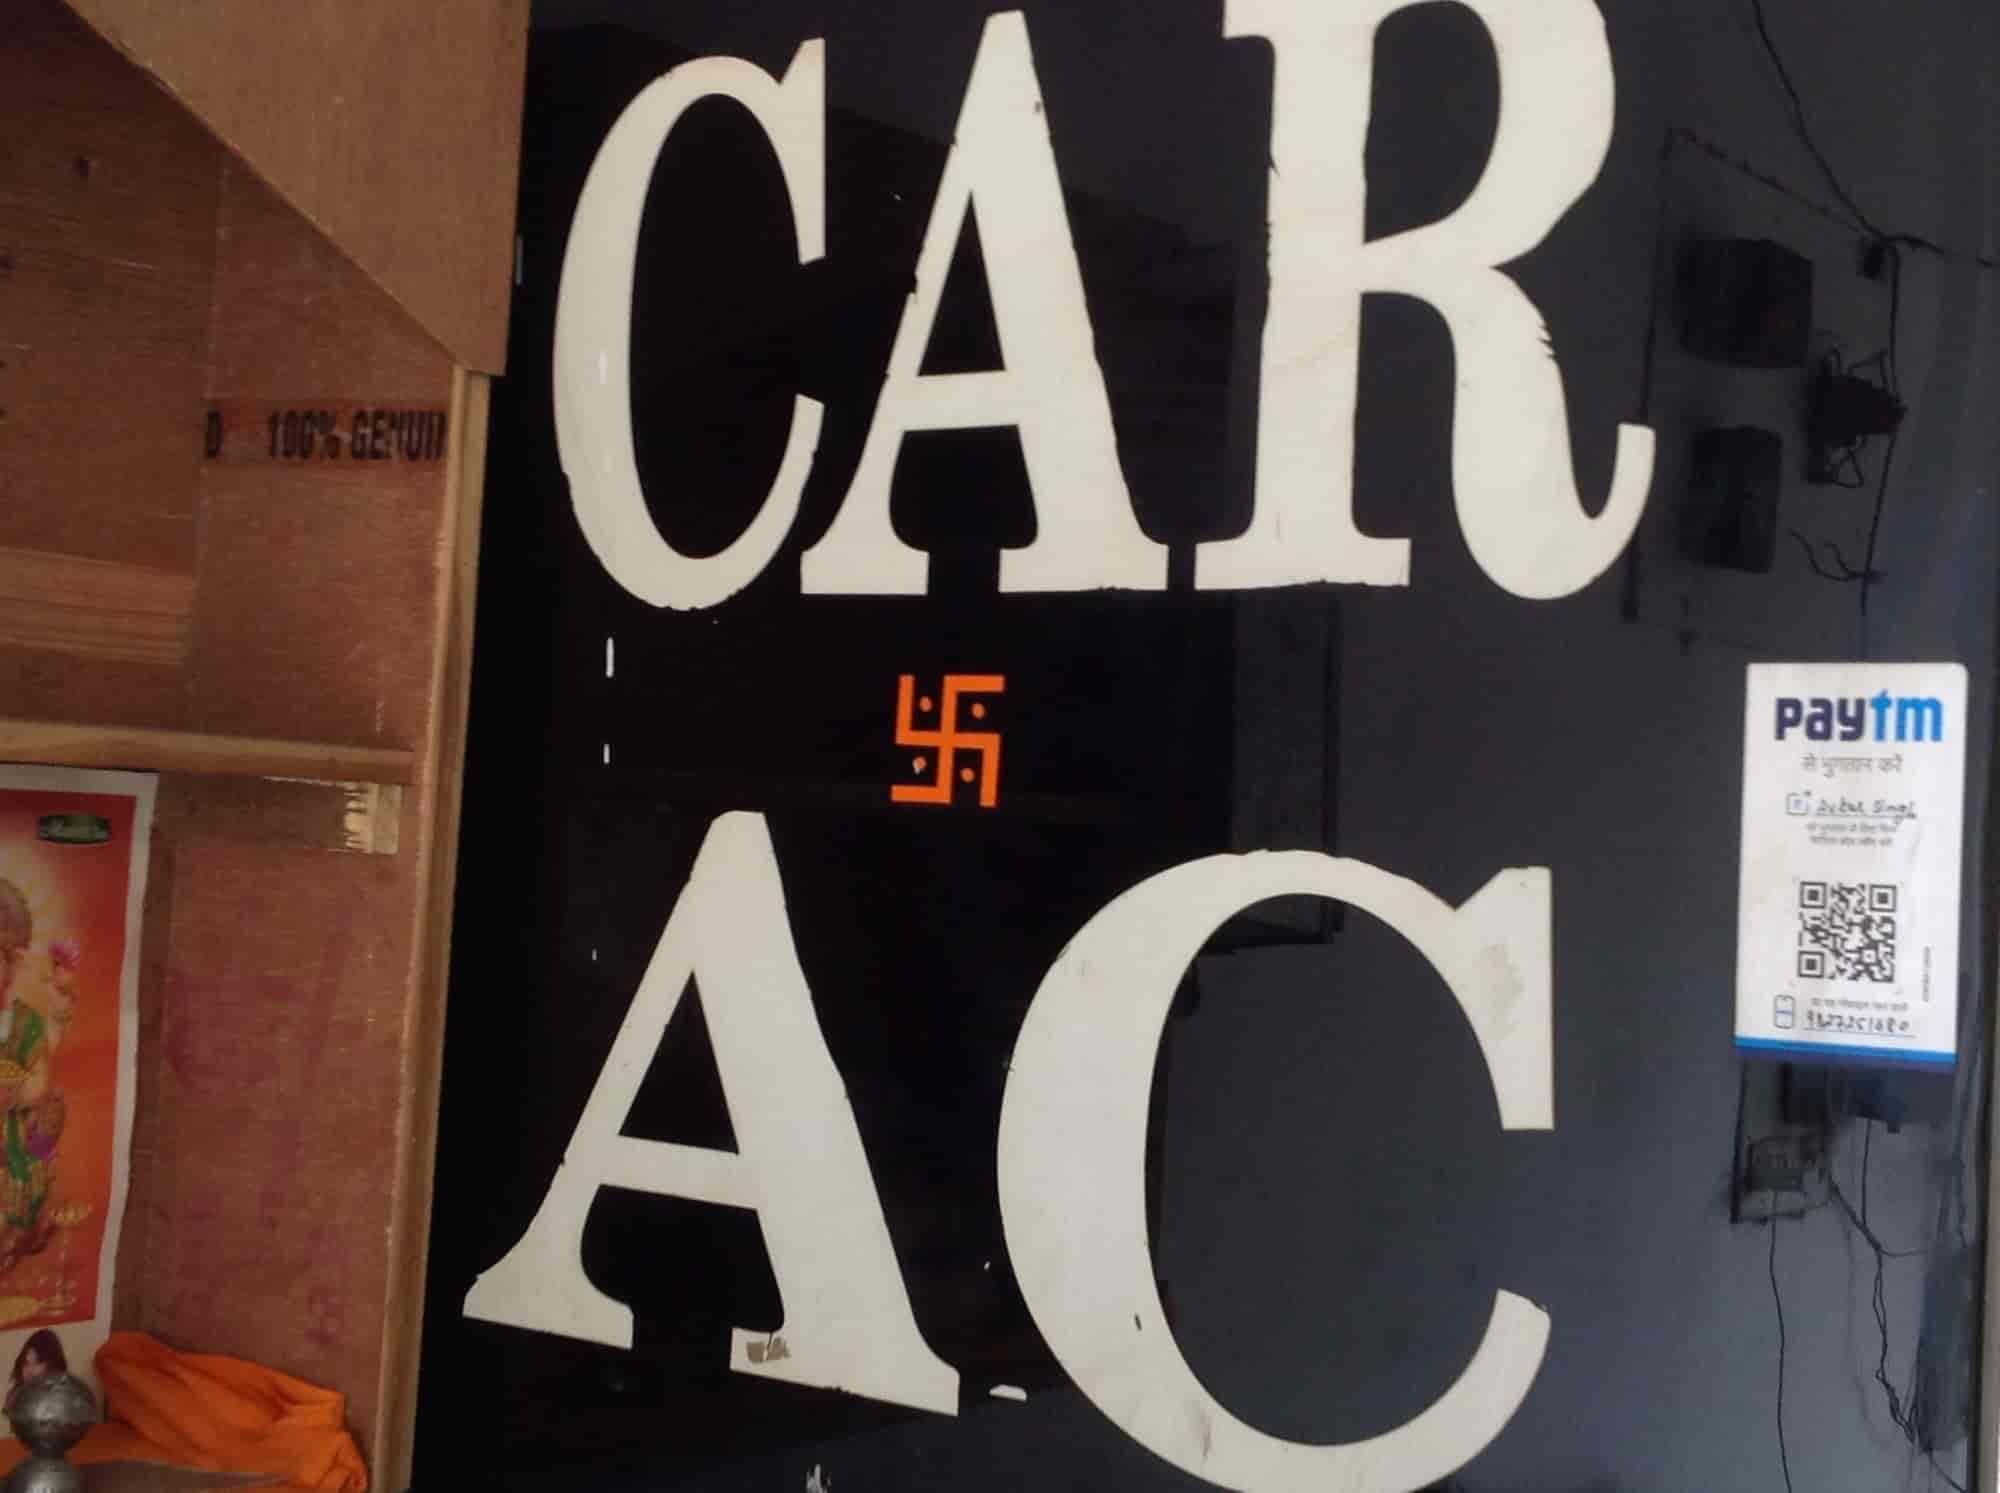 Jeet Car Ac Photos, M P Nagar, Bhopal- Pictures & Images Gallery